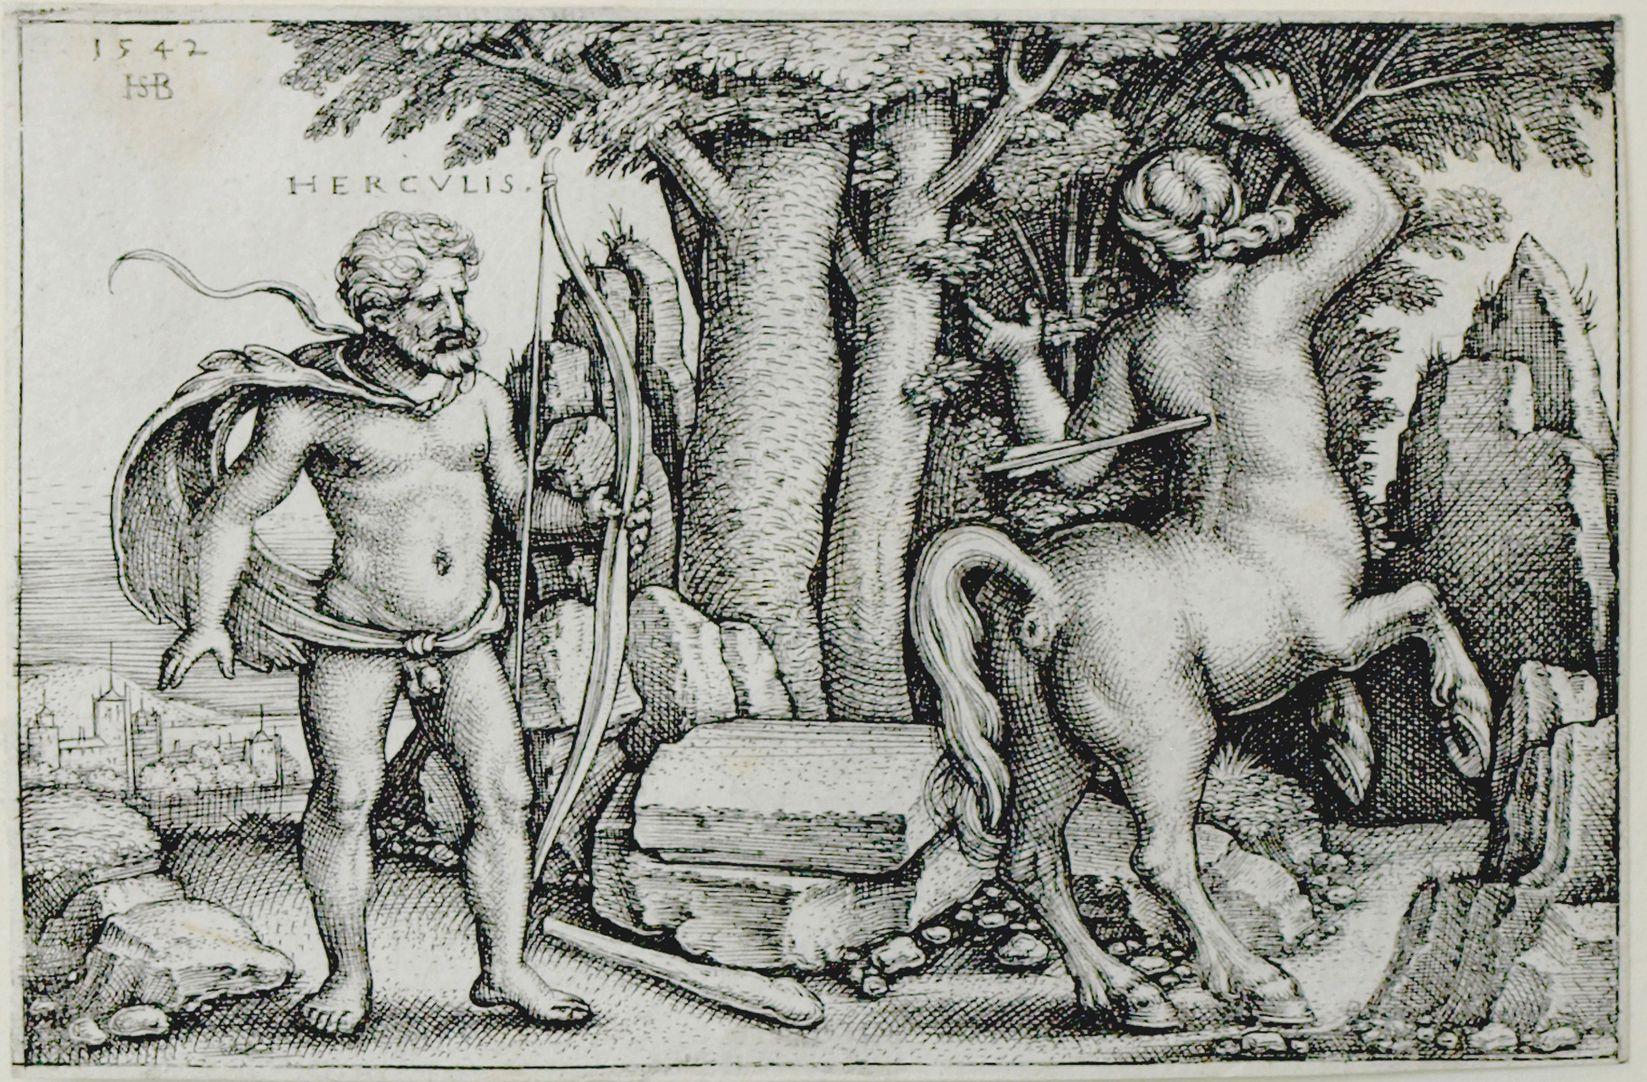 The deeds of Hercules Hercules kills Nessus 1542, 50 x 78 mm